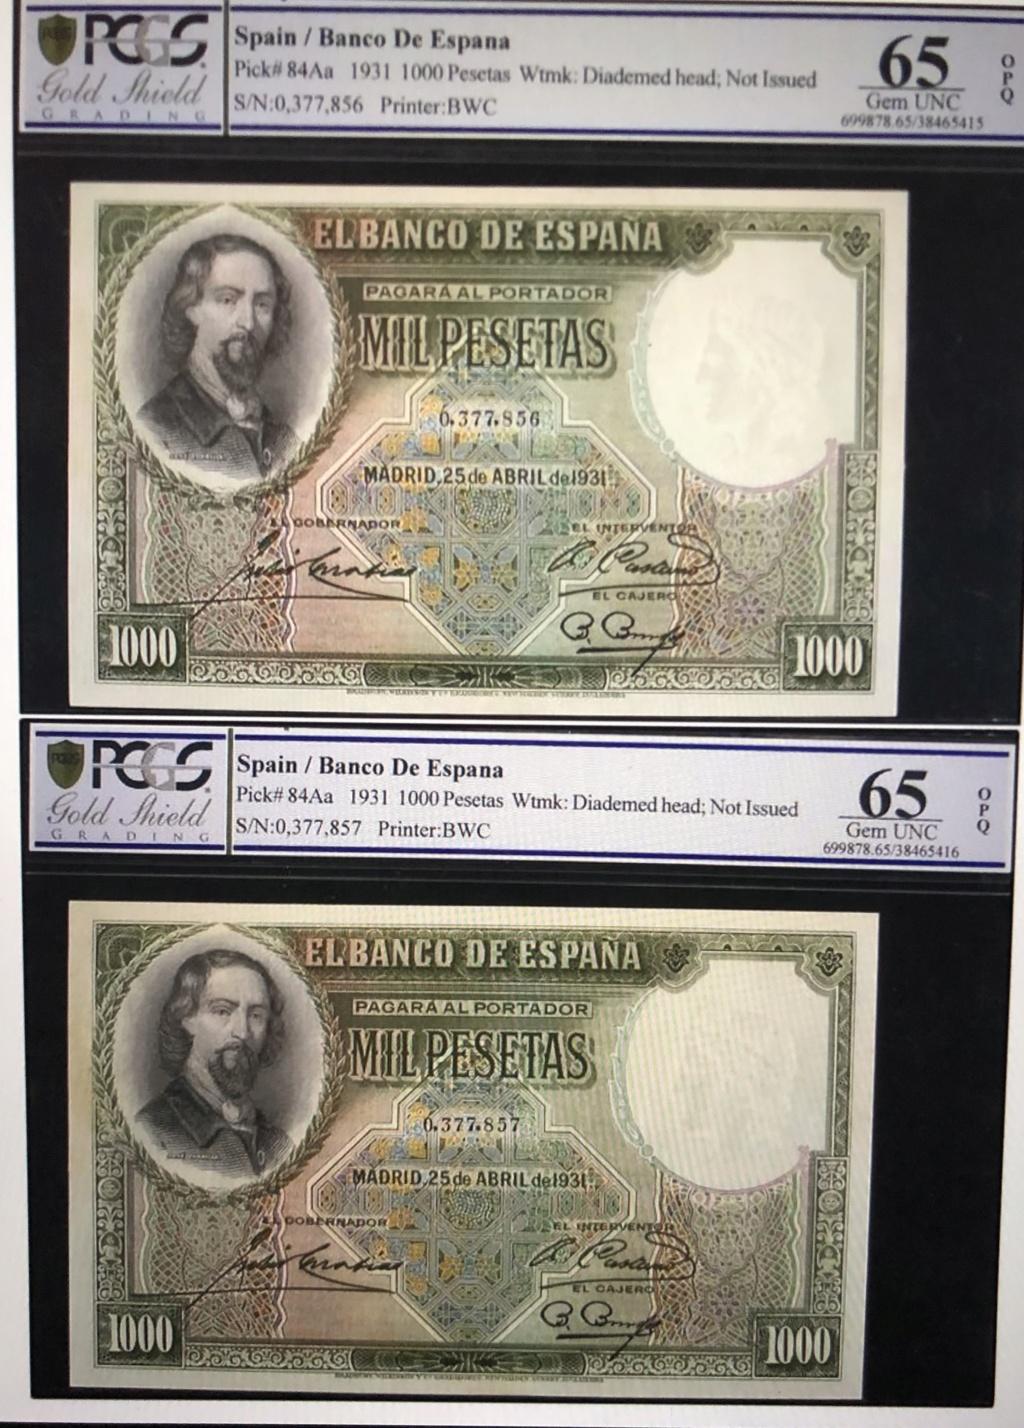 GRANDES MISTERIOS (I) - Tacos existentes 1000 pesetas 1931 Zorrilla - Página 7 Img_6710